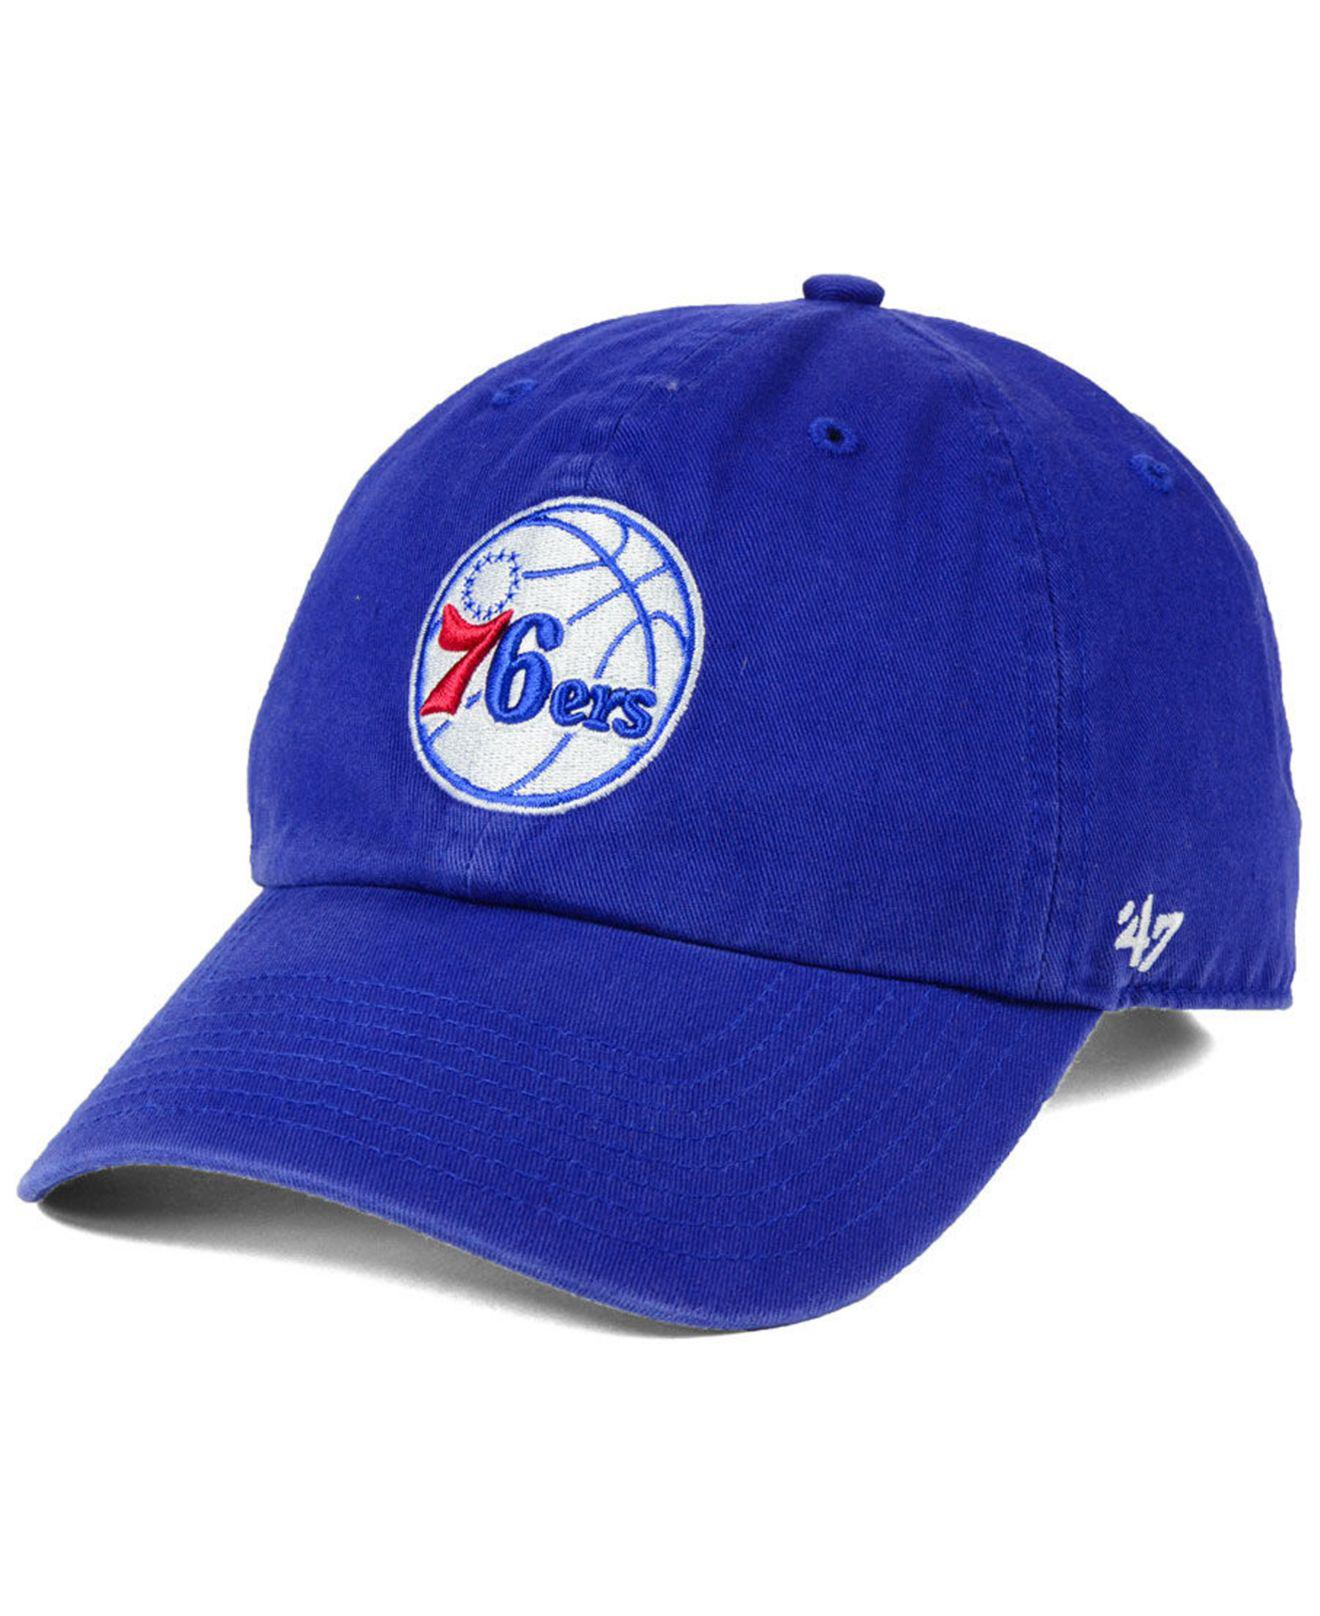 Lyst - 47 Brand Philadelphia 76ers Clean Up Cap in Blue for Men ed309a7d45f7